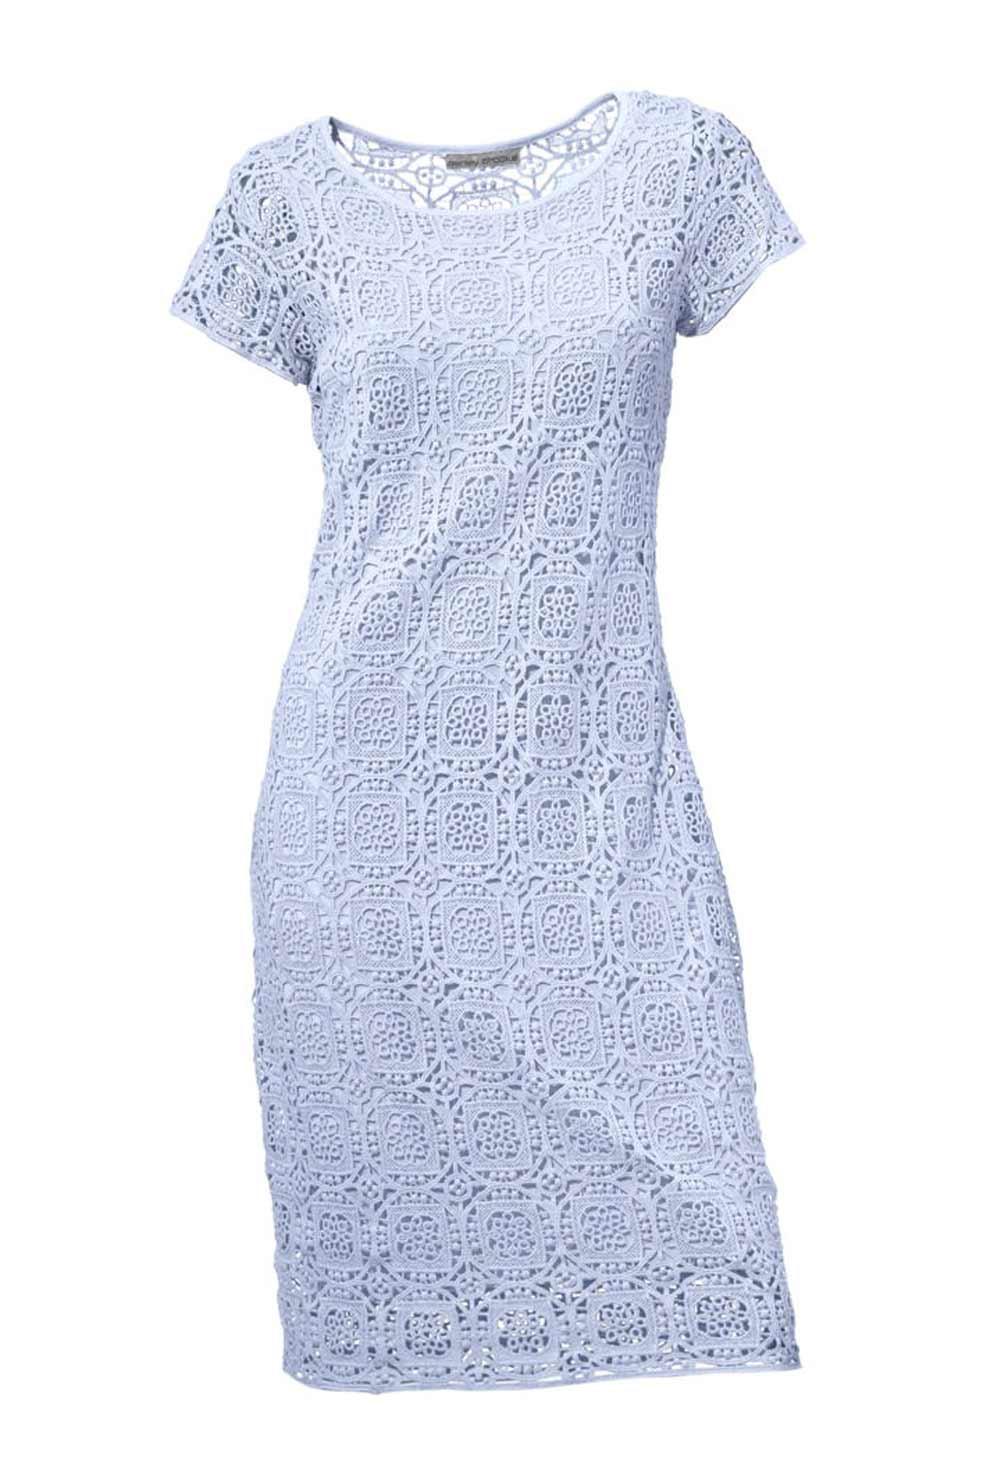 designer spitzenkleid hellblau kleider outlet mode shop